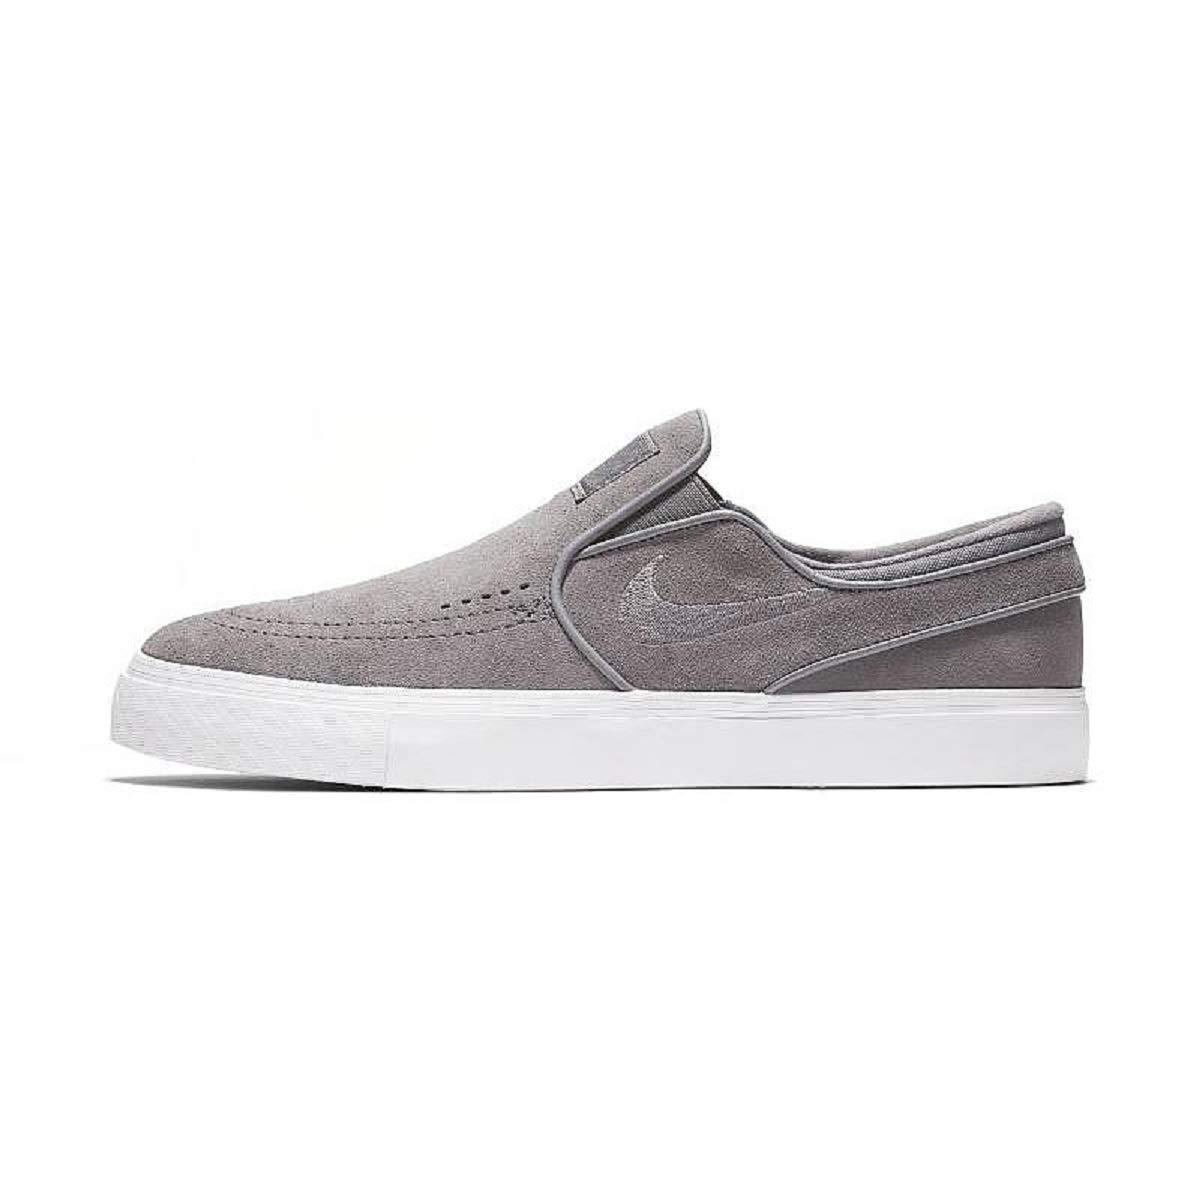 buy popular b72fd 1754e Amazon.com   NIKE SB Zoom Stefan Janoski Slip-On Men s Skateboarding Shoe  (10.5 D(M) US)   Skateboarding